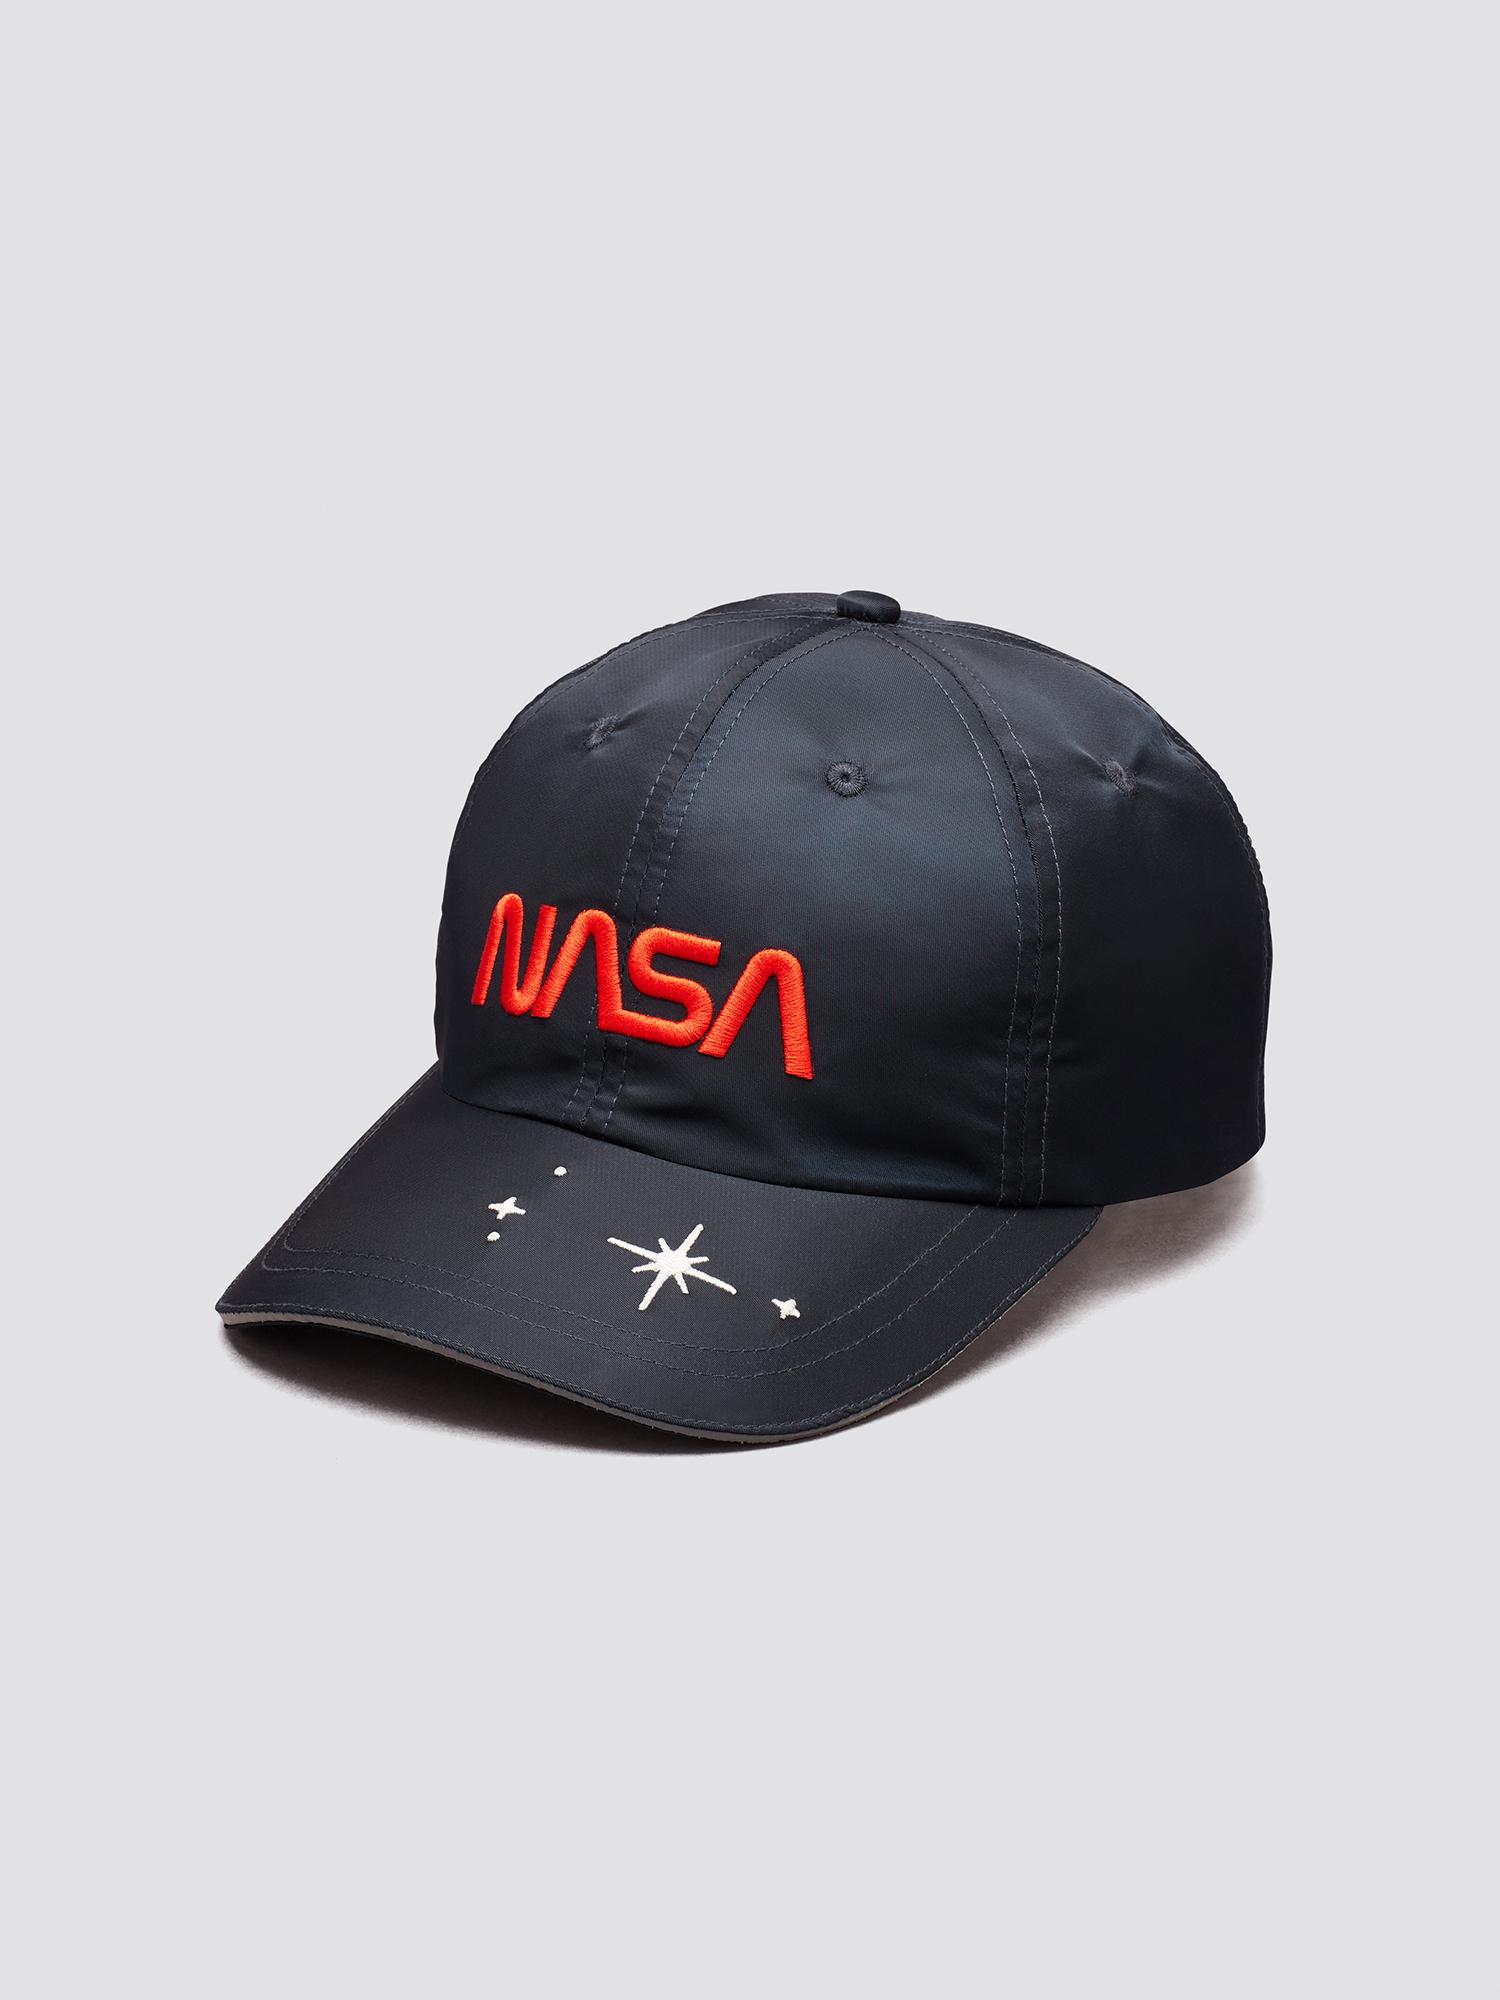 Alpha Industries x NASA